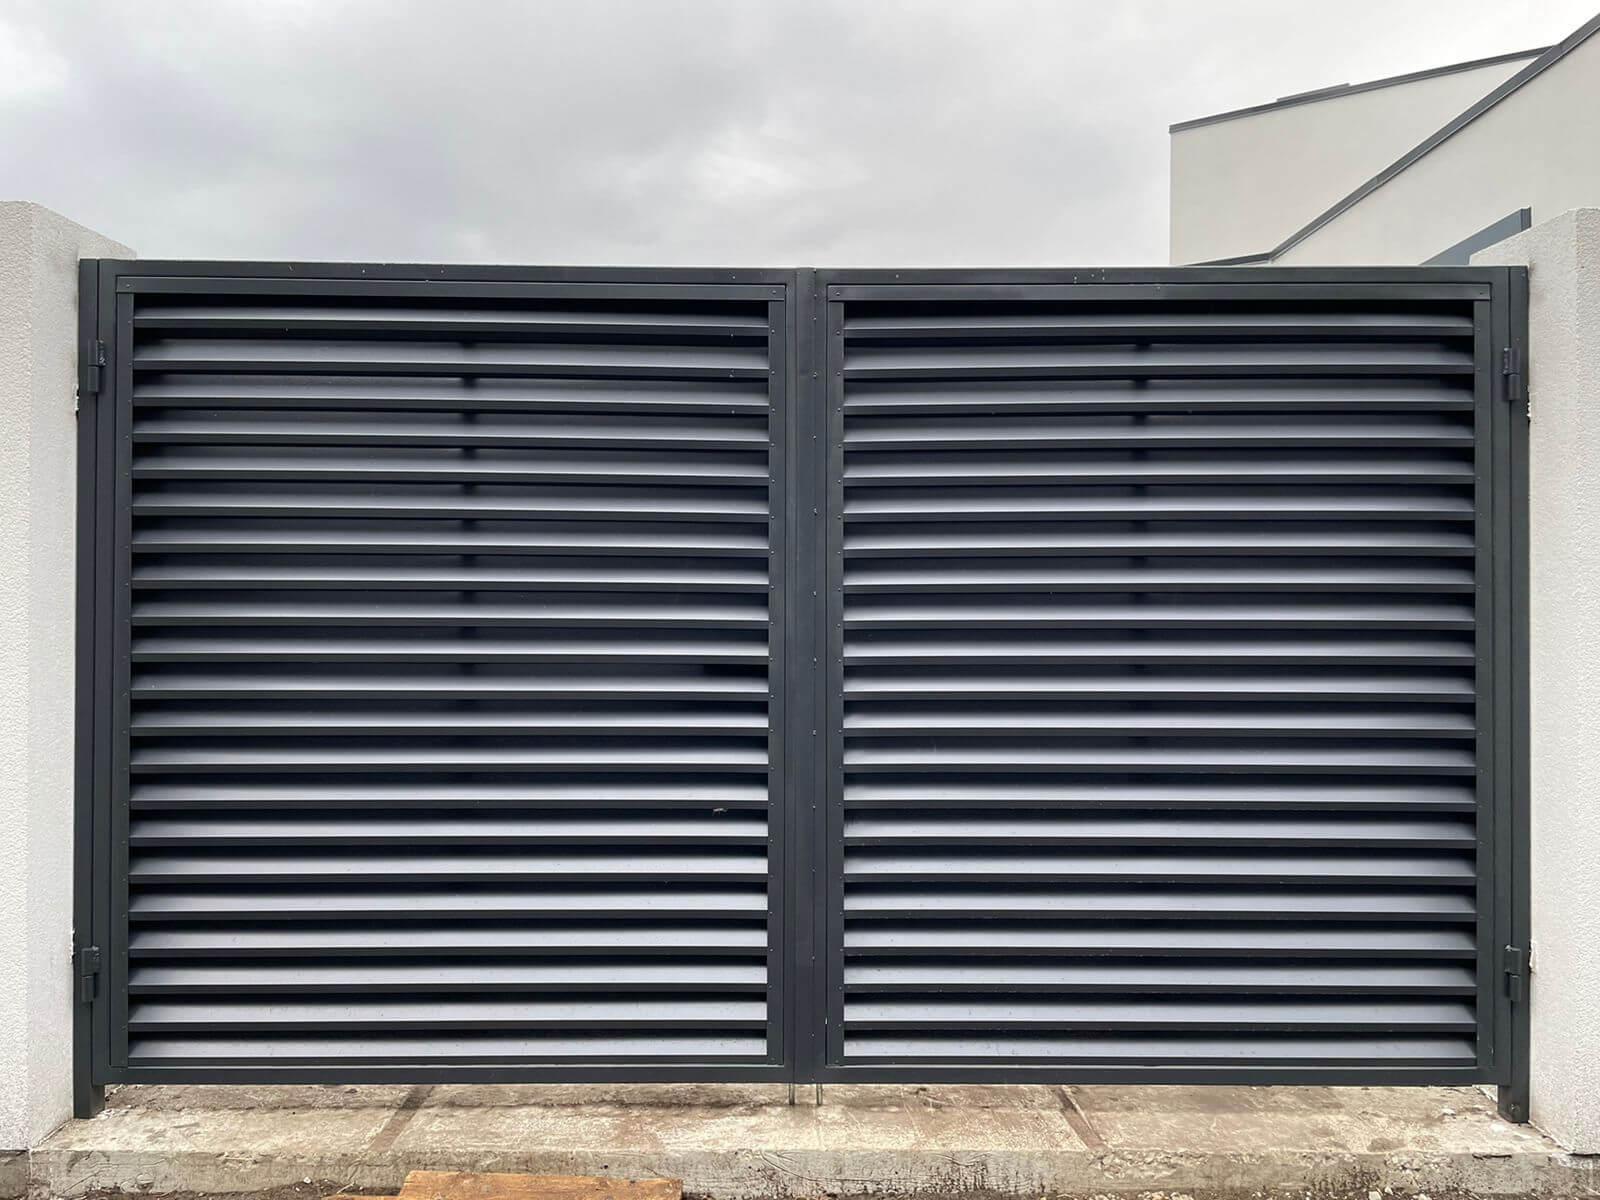 забор-жалюзи с ламелями ЭКО-Z Серый Графит двухсторонний фото4